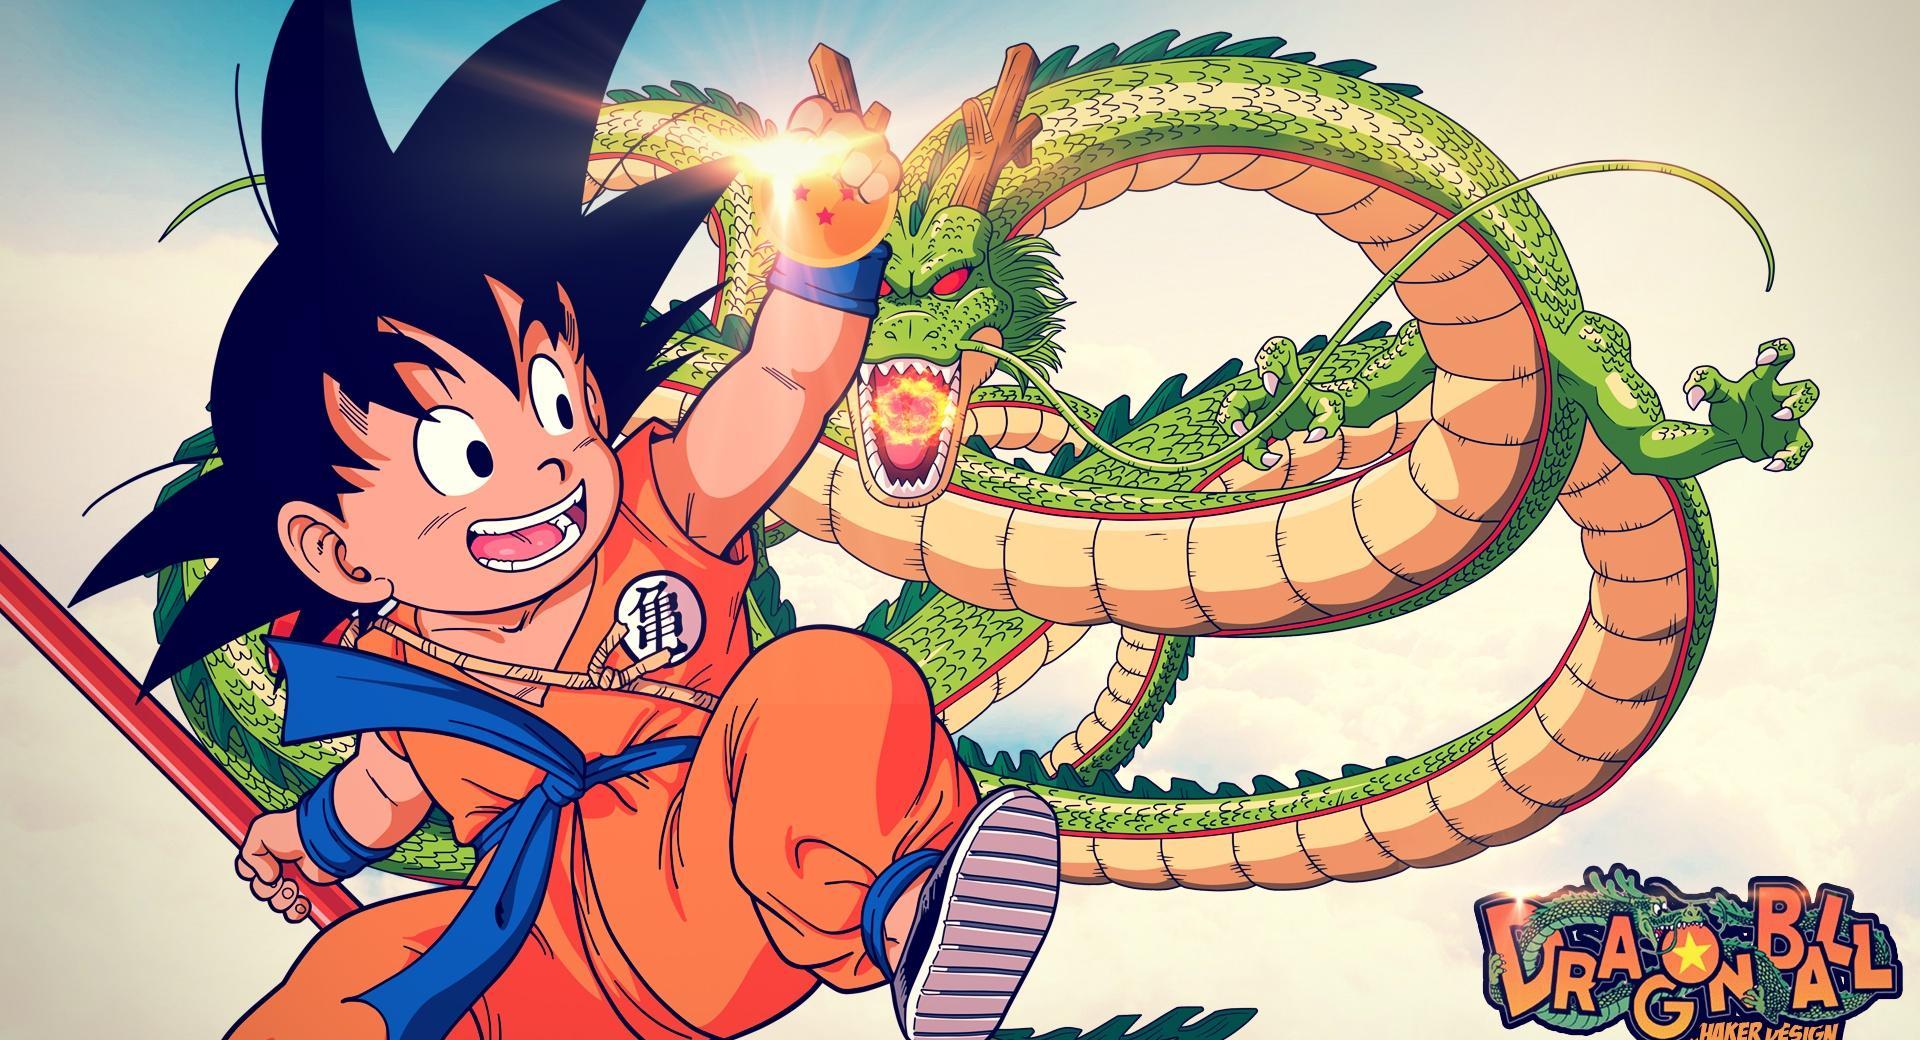 Dragon Ball - HD Wallpaper by Chaker Design wallpapers HD quality